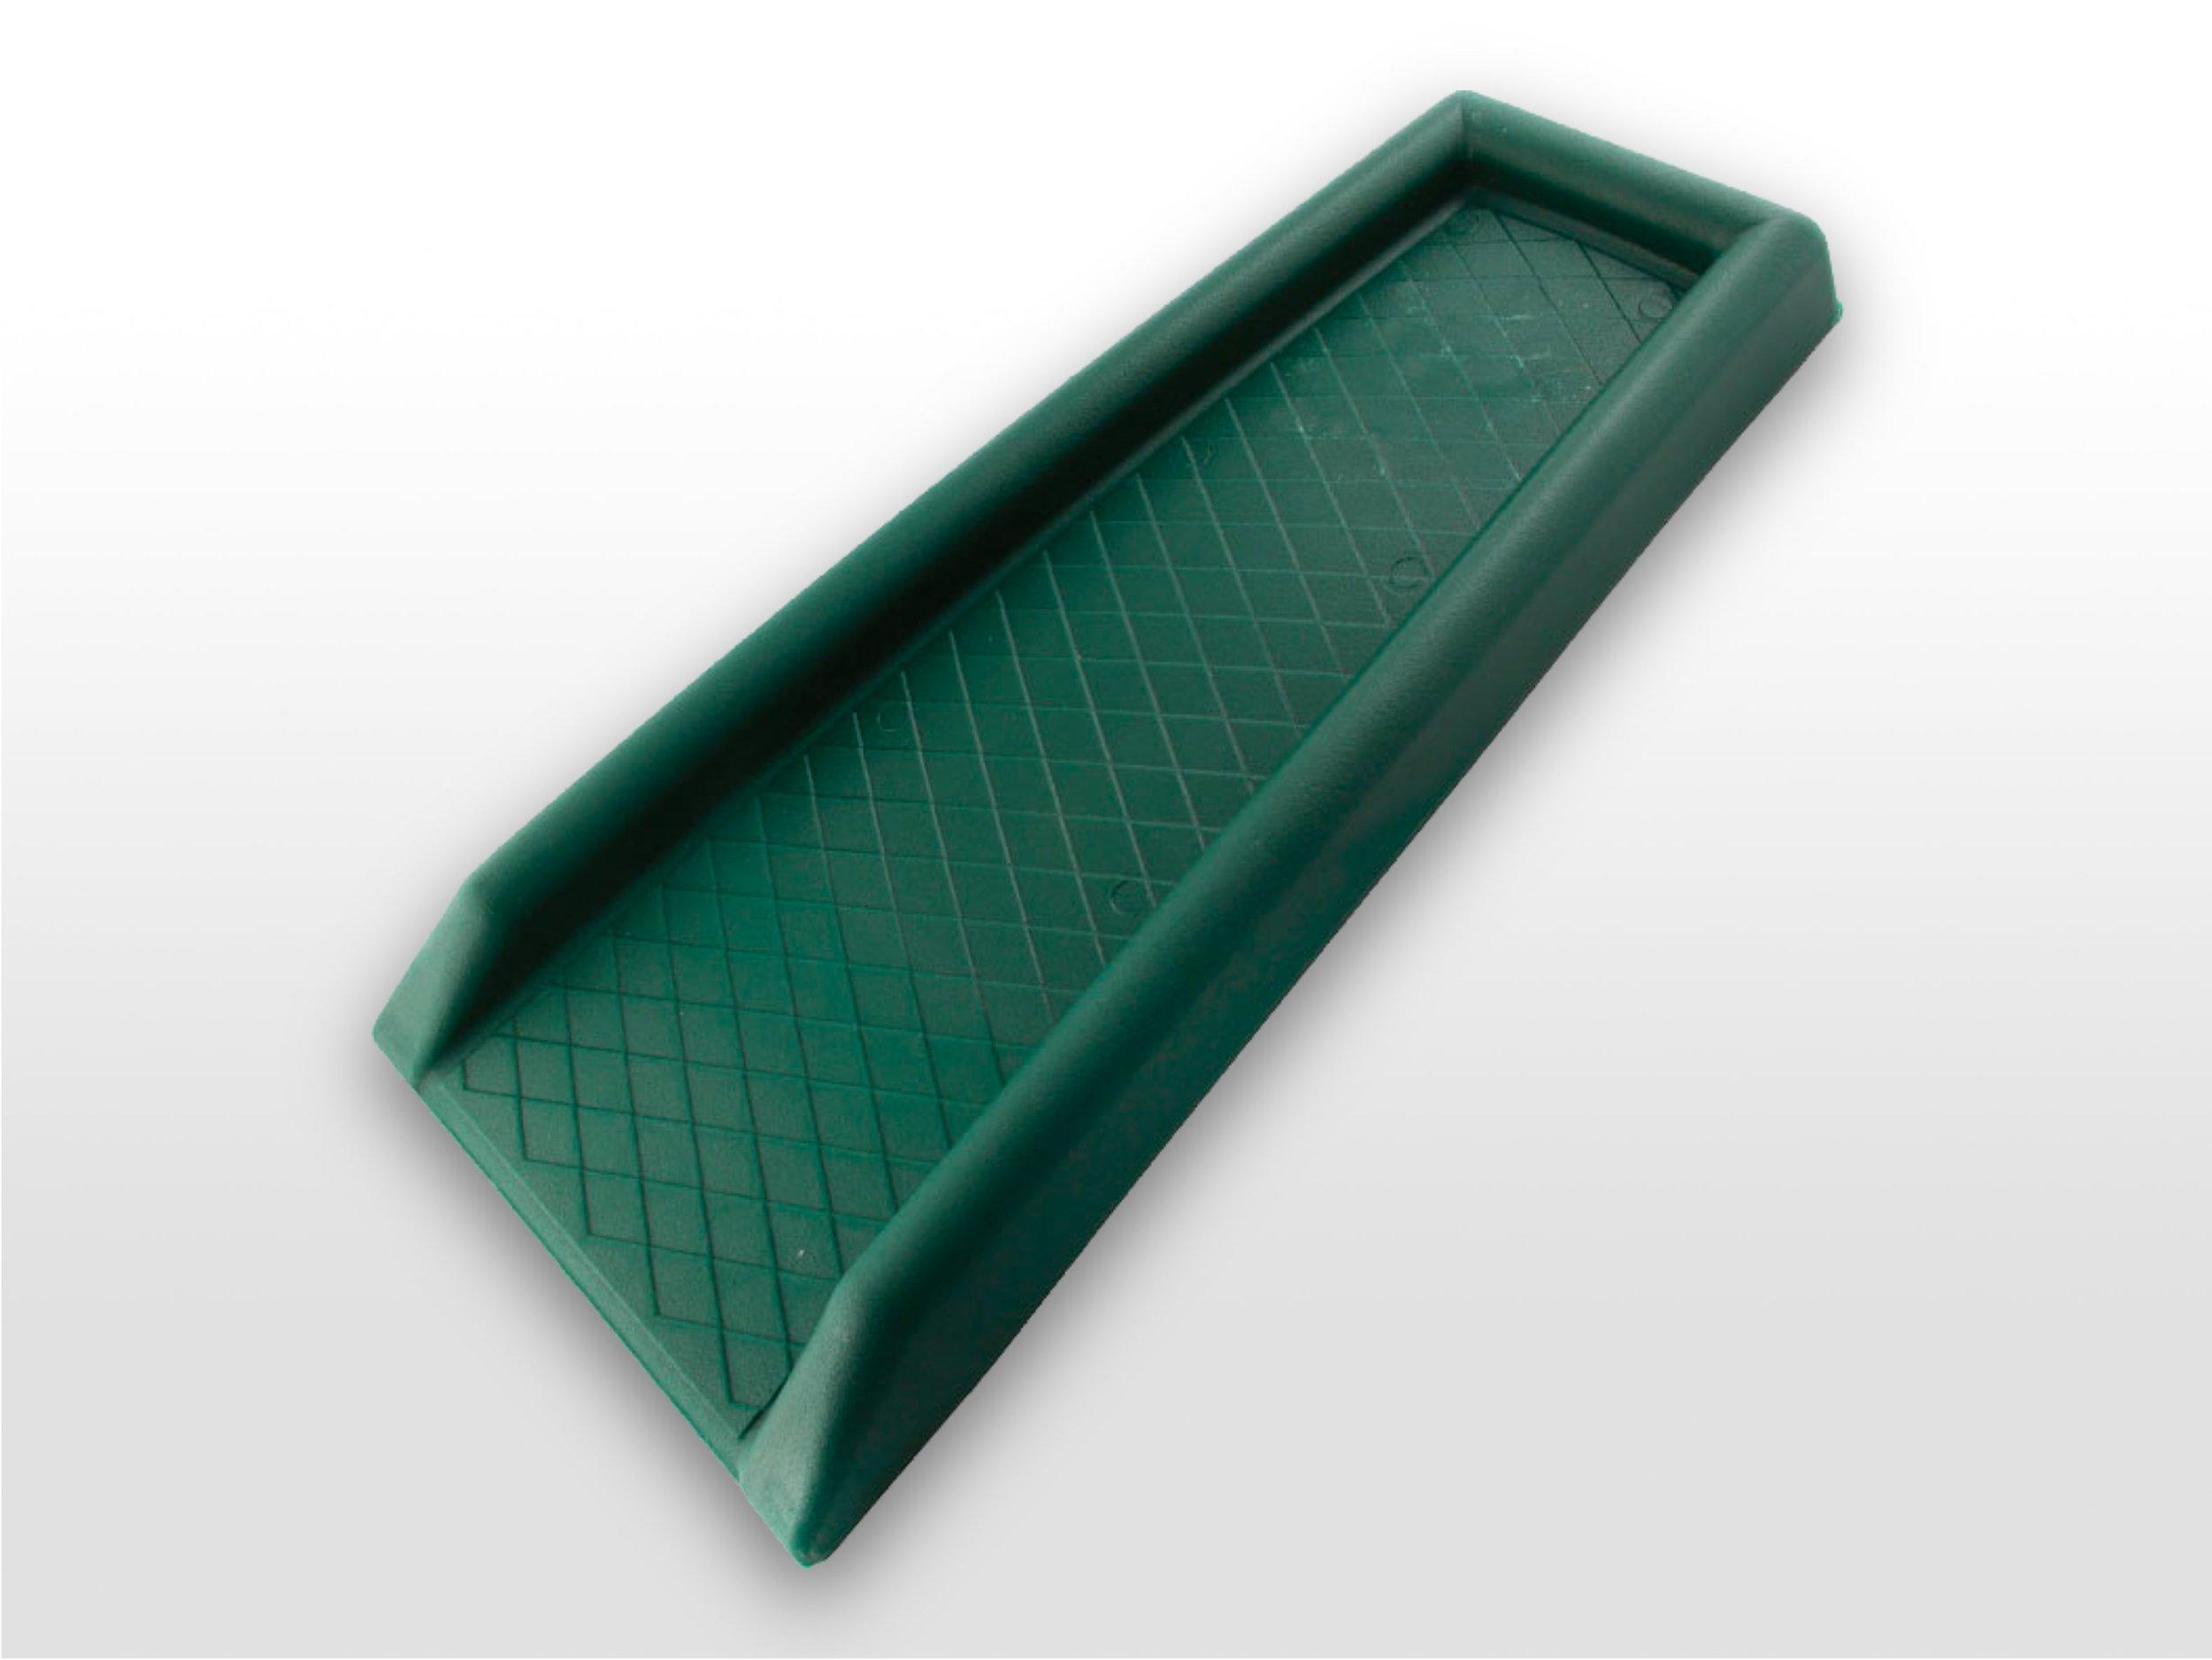 PVC Splash Block  one size; packaged 10 pcs/carton  Green PVC